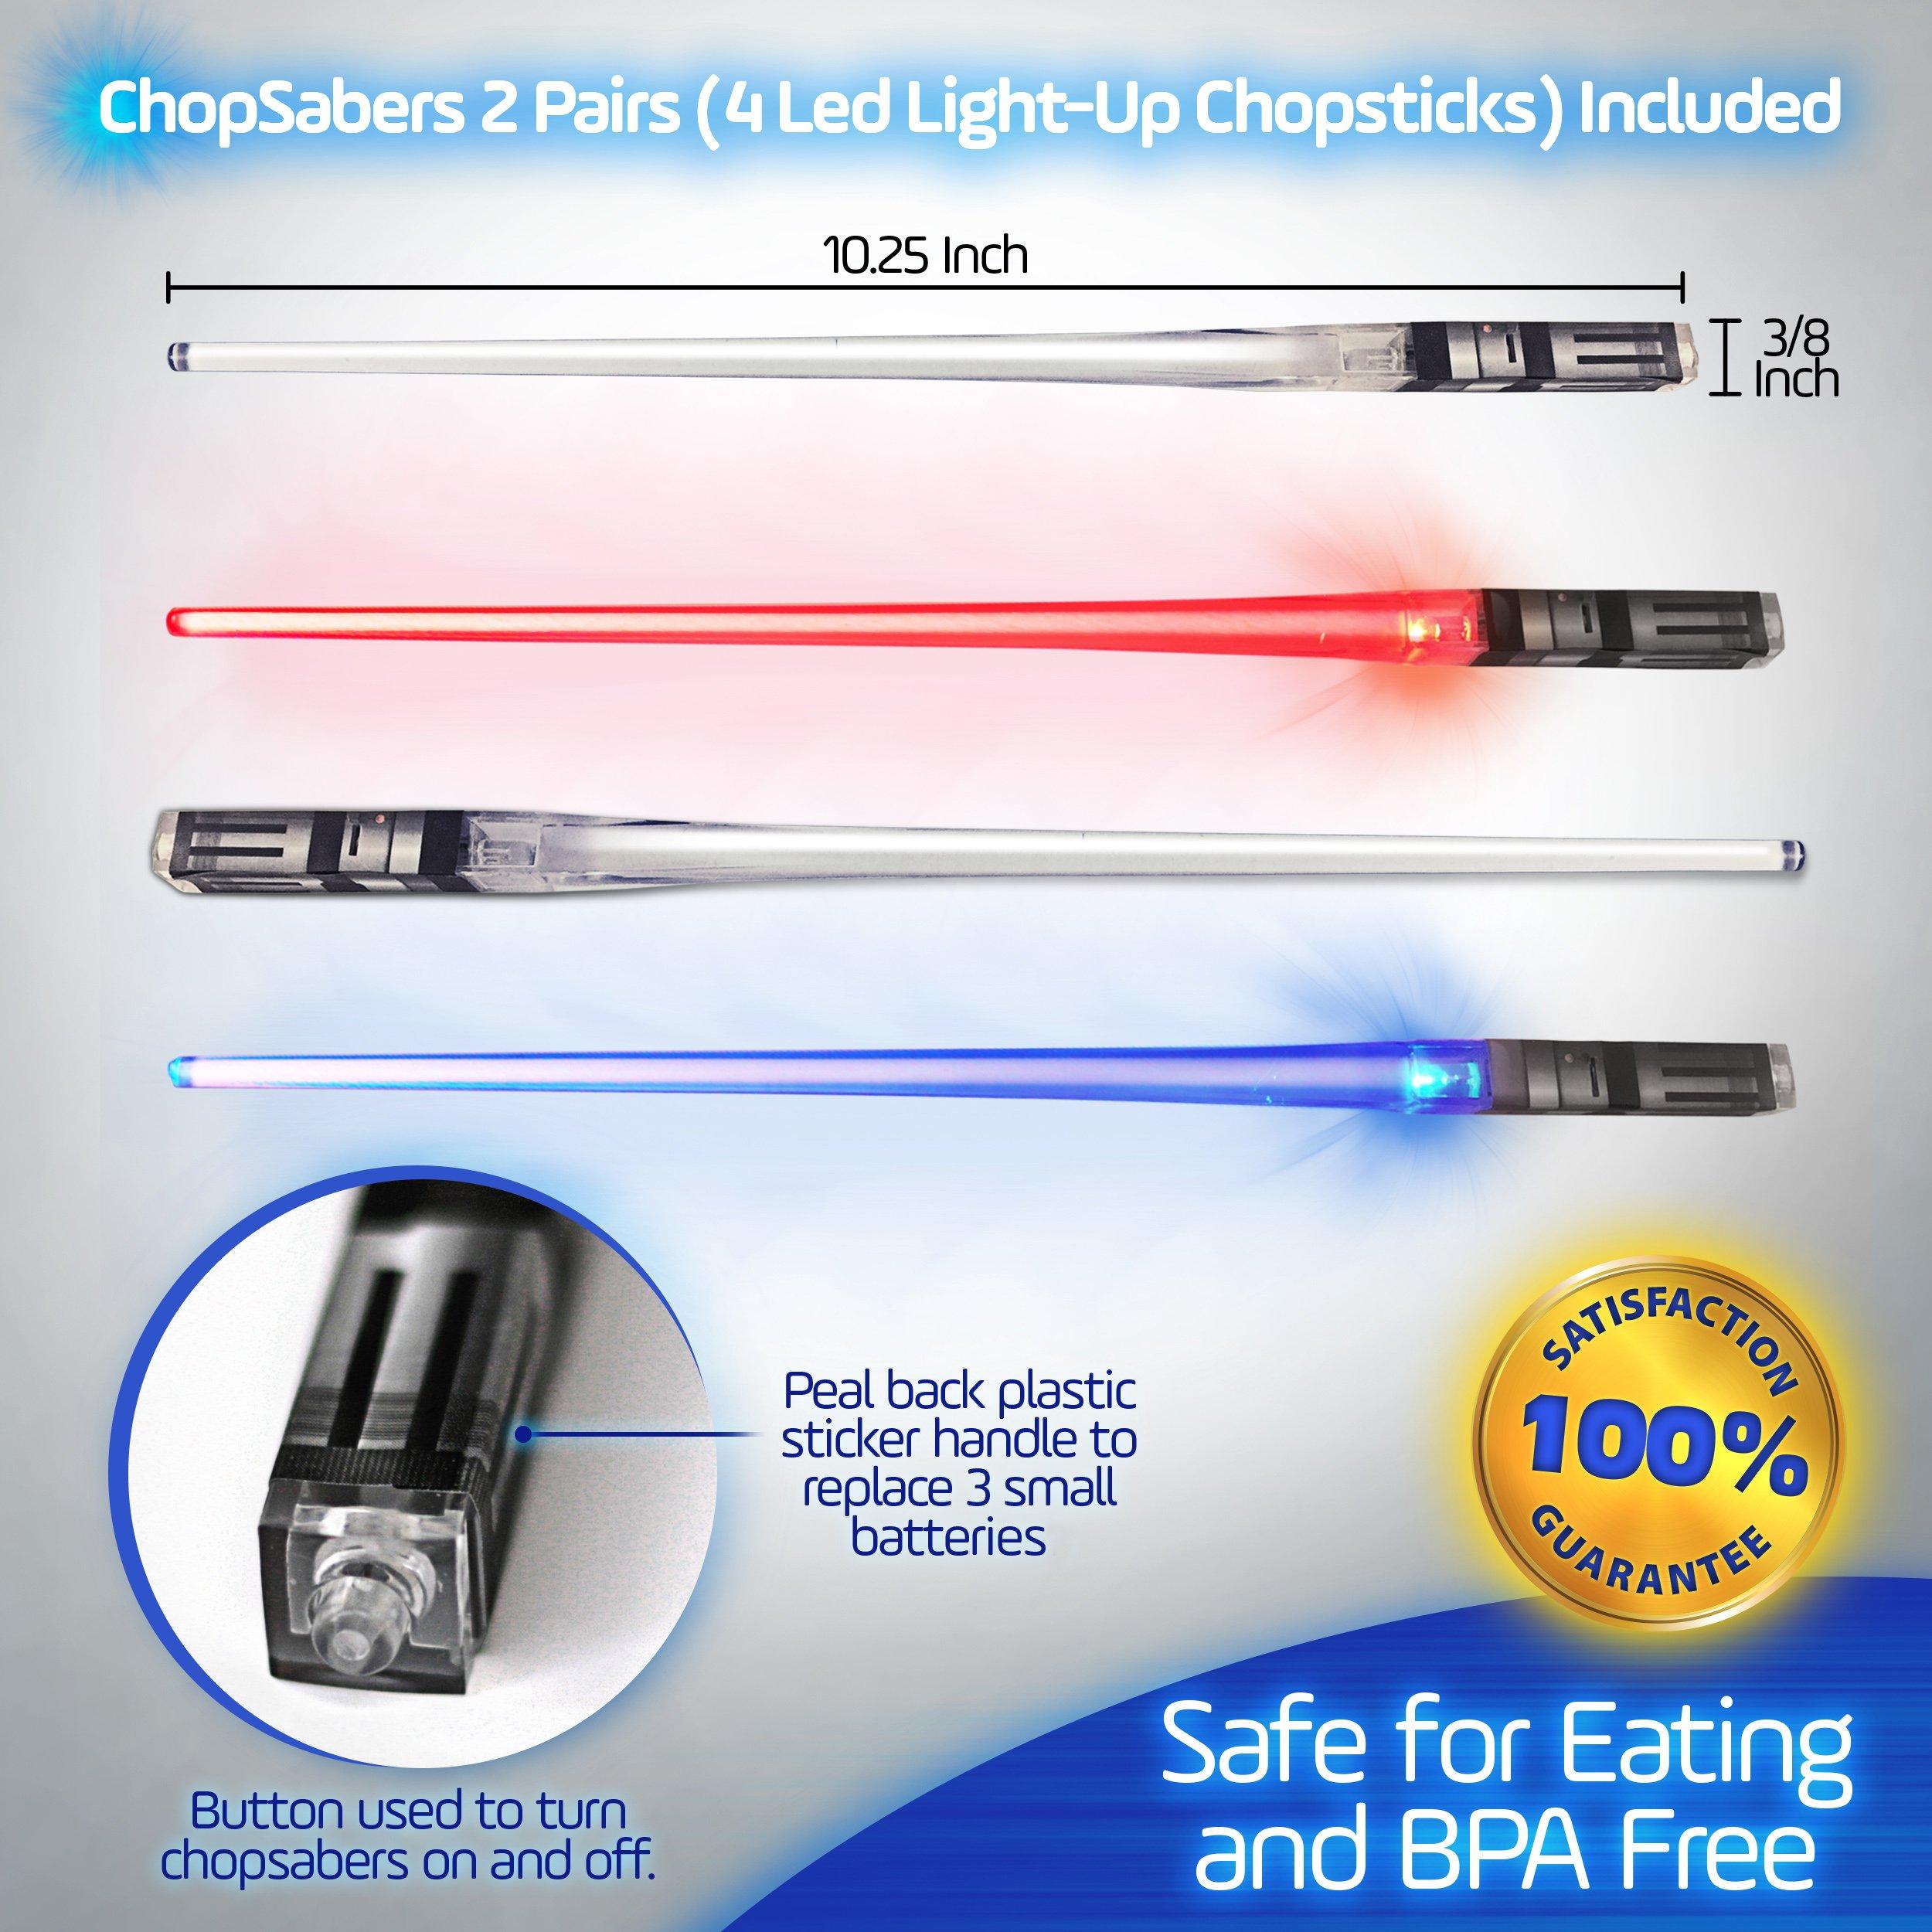 Sabers Chop Lightsaber Led Light Up Chopsticks 2 Pair Red Blue by Chopsabers (Image #5)